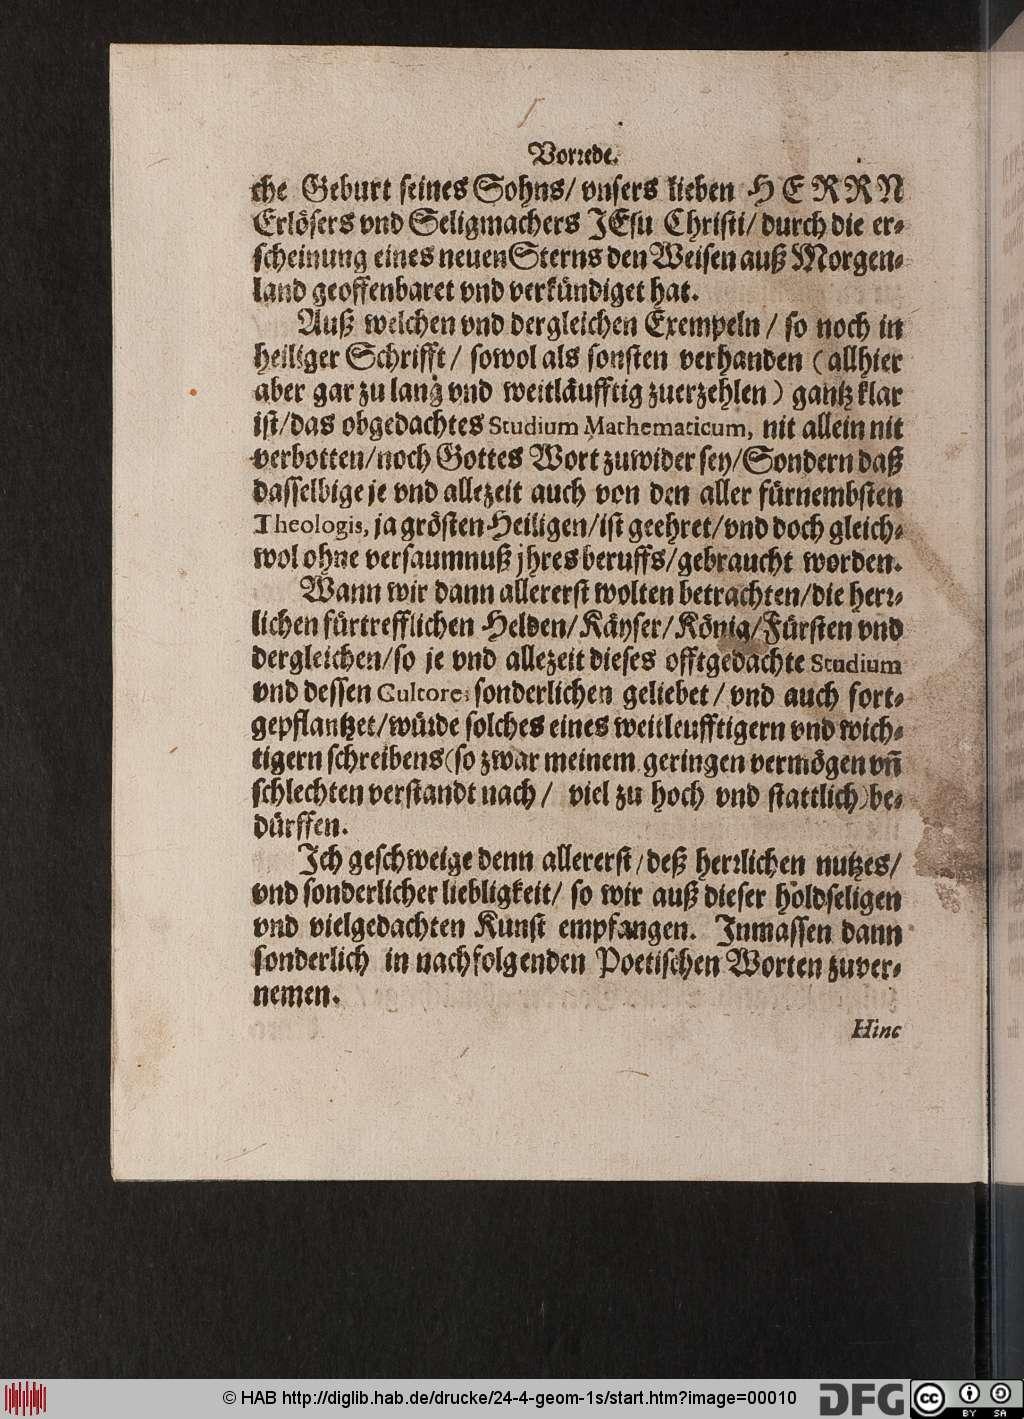 http://diglib.hab.de/drucke/24-4-geom-1s/00010.jpg